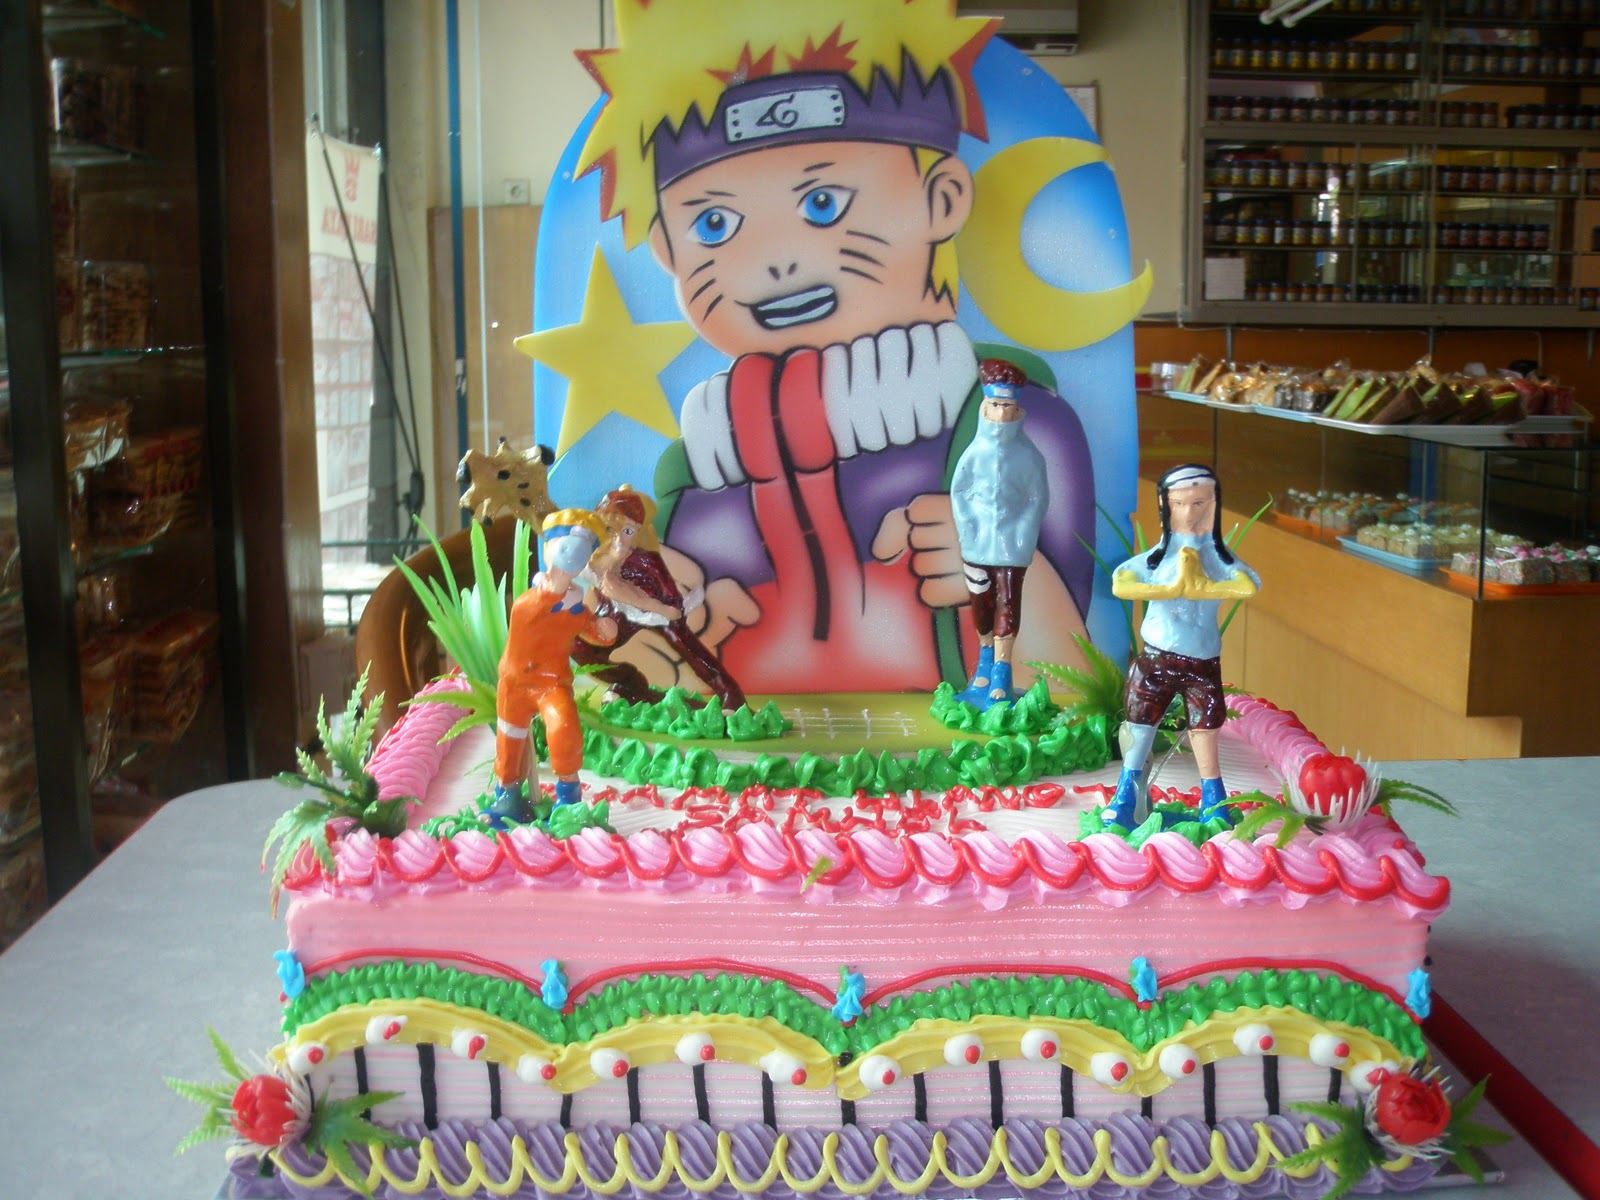 Kue T Ulang Tahun Holland Bakery